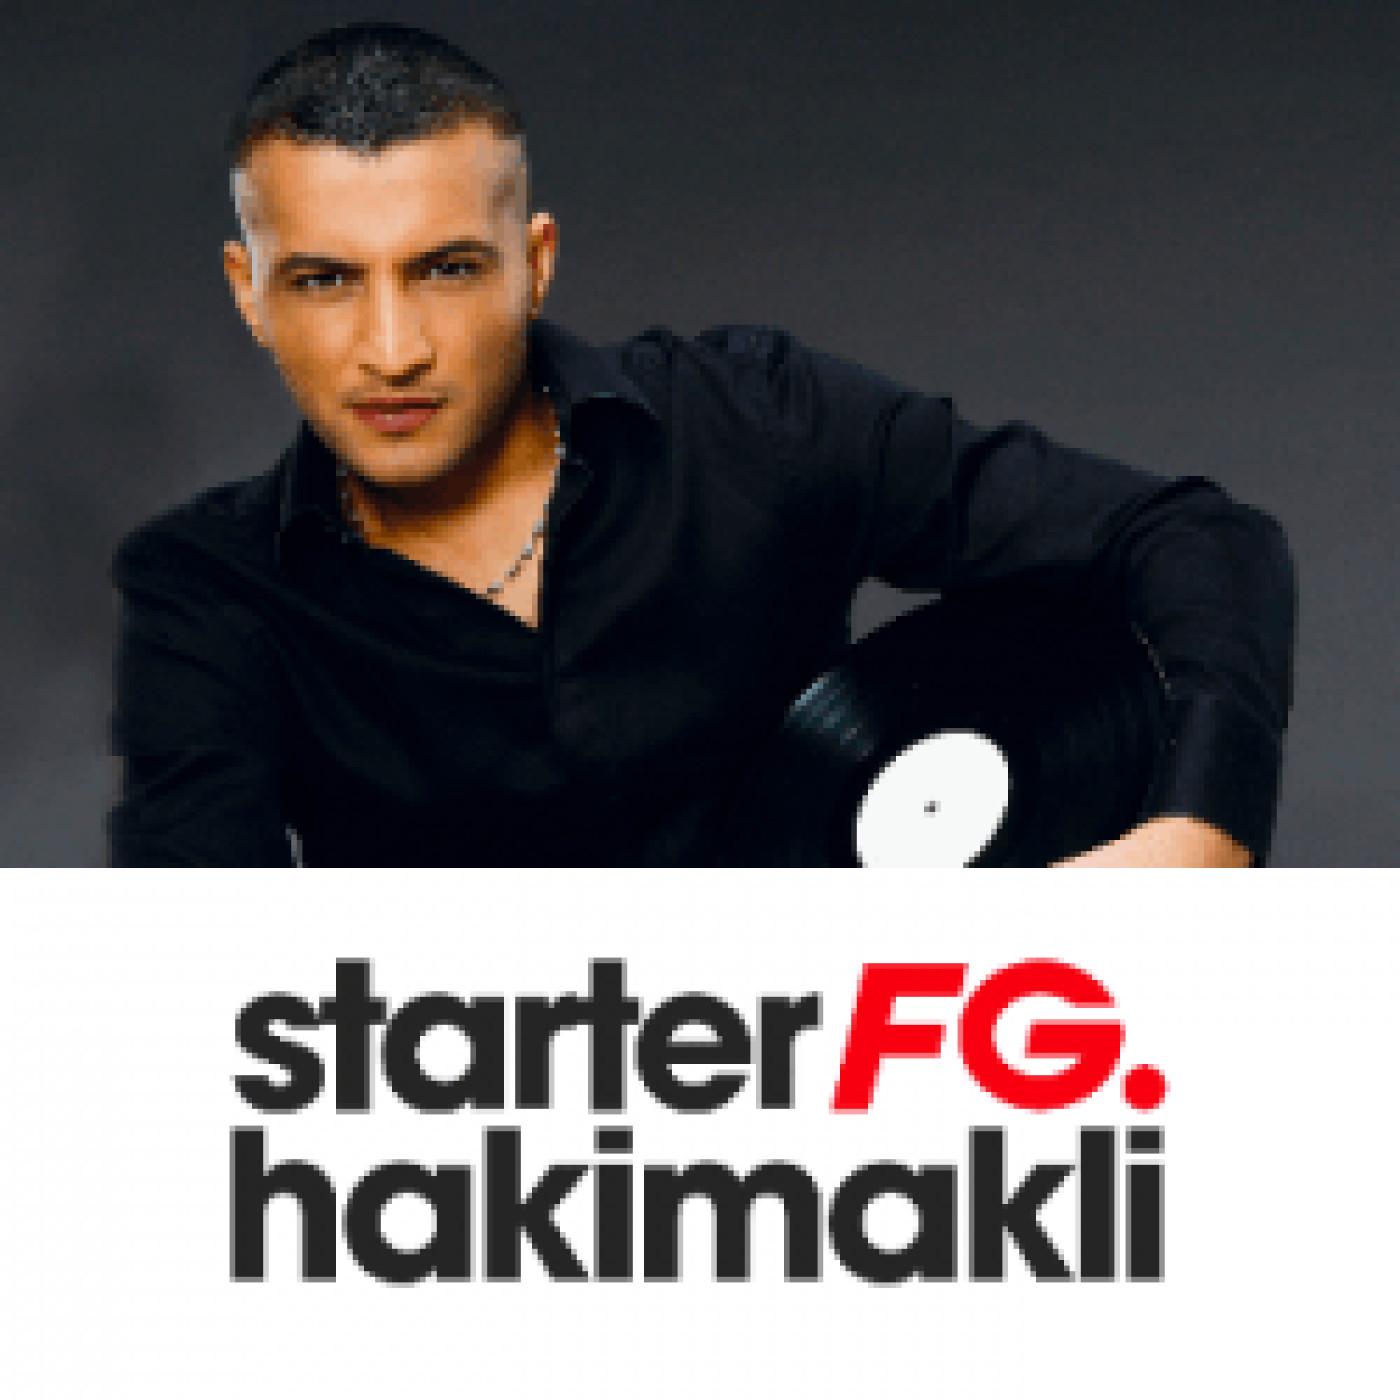 STARTER FG BY HAKIMAKLI MARDI 10 NOVEMBRE 2020